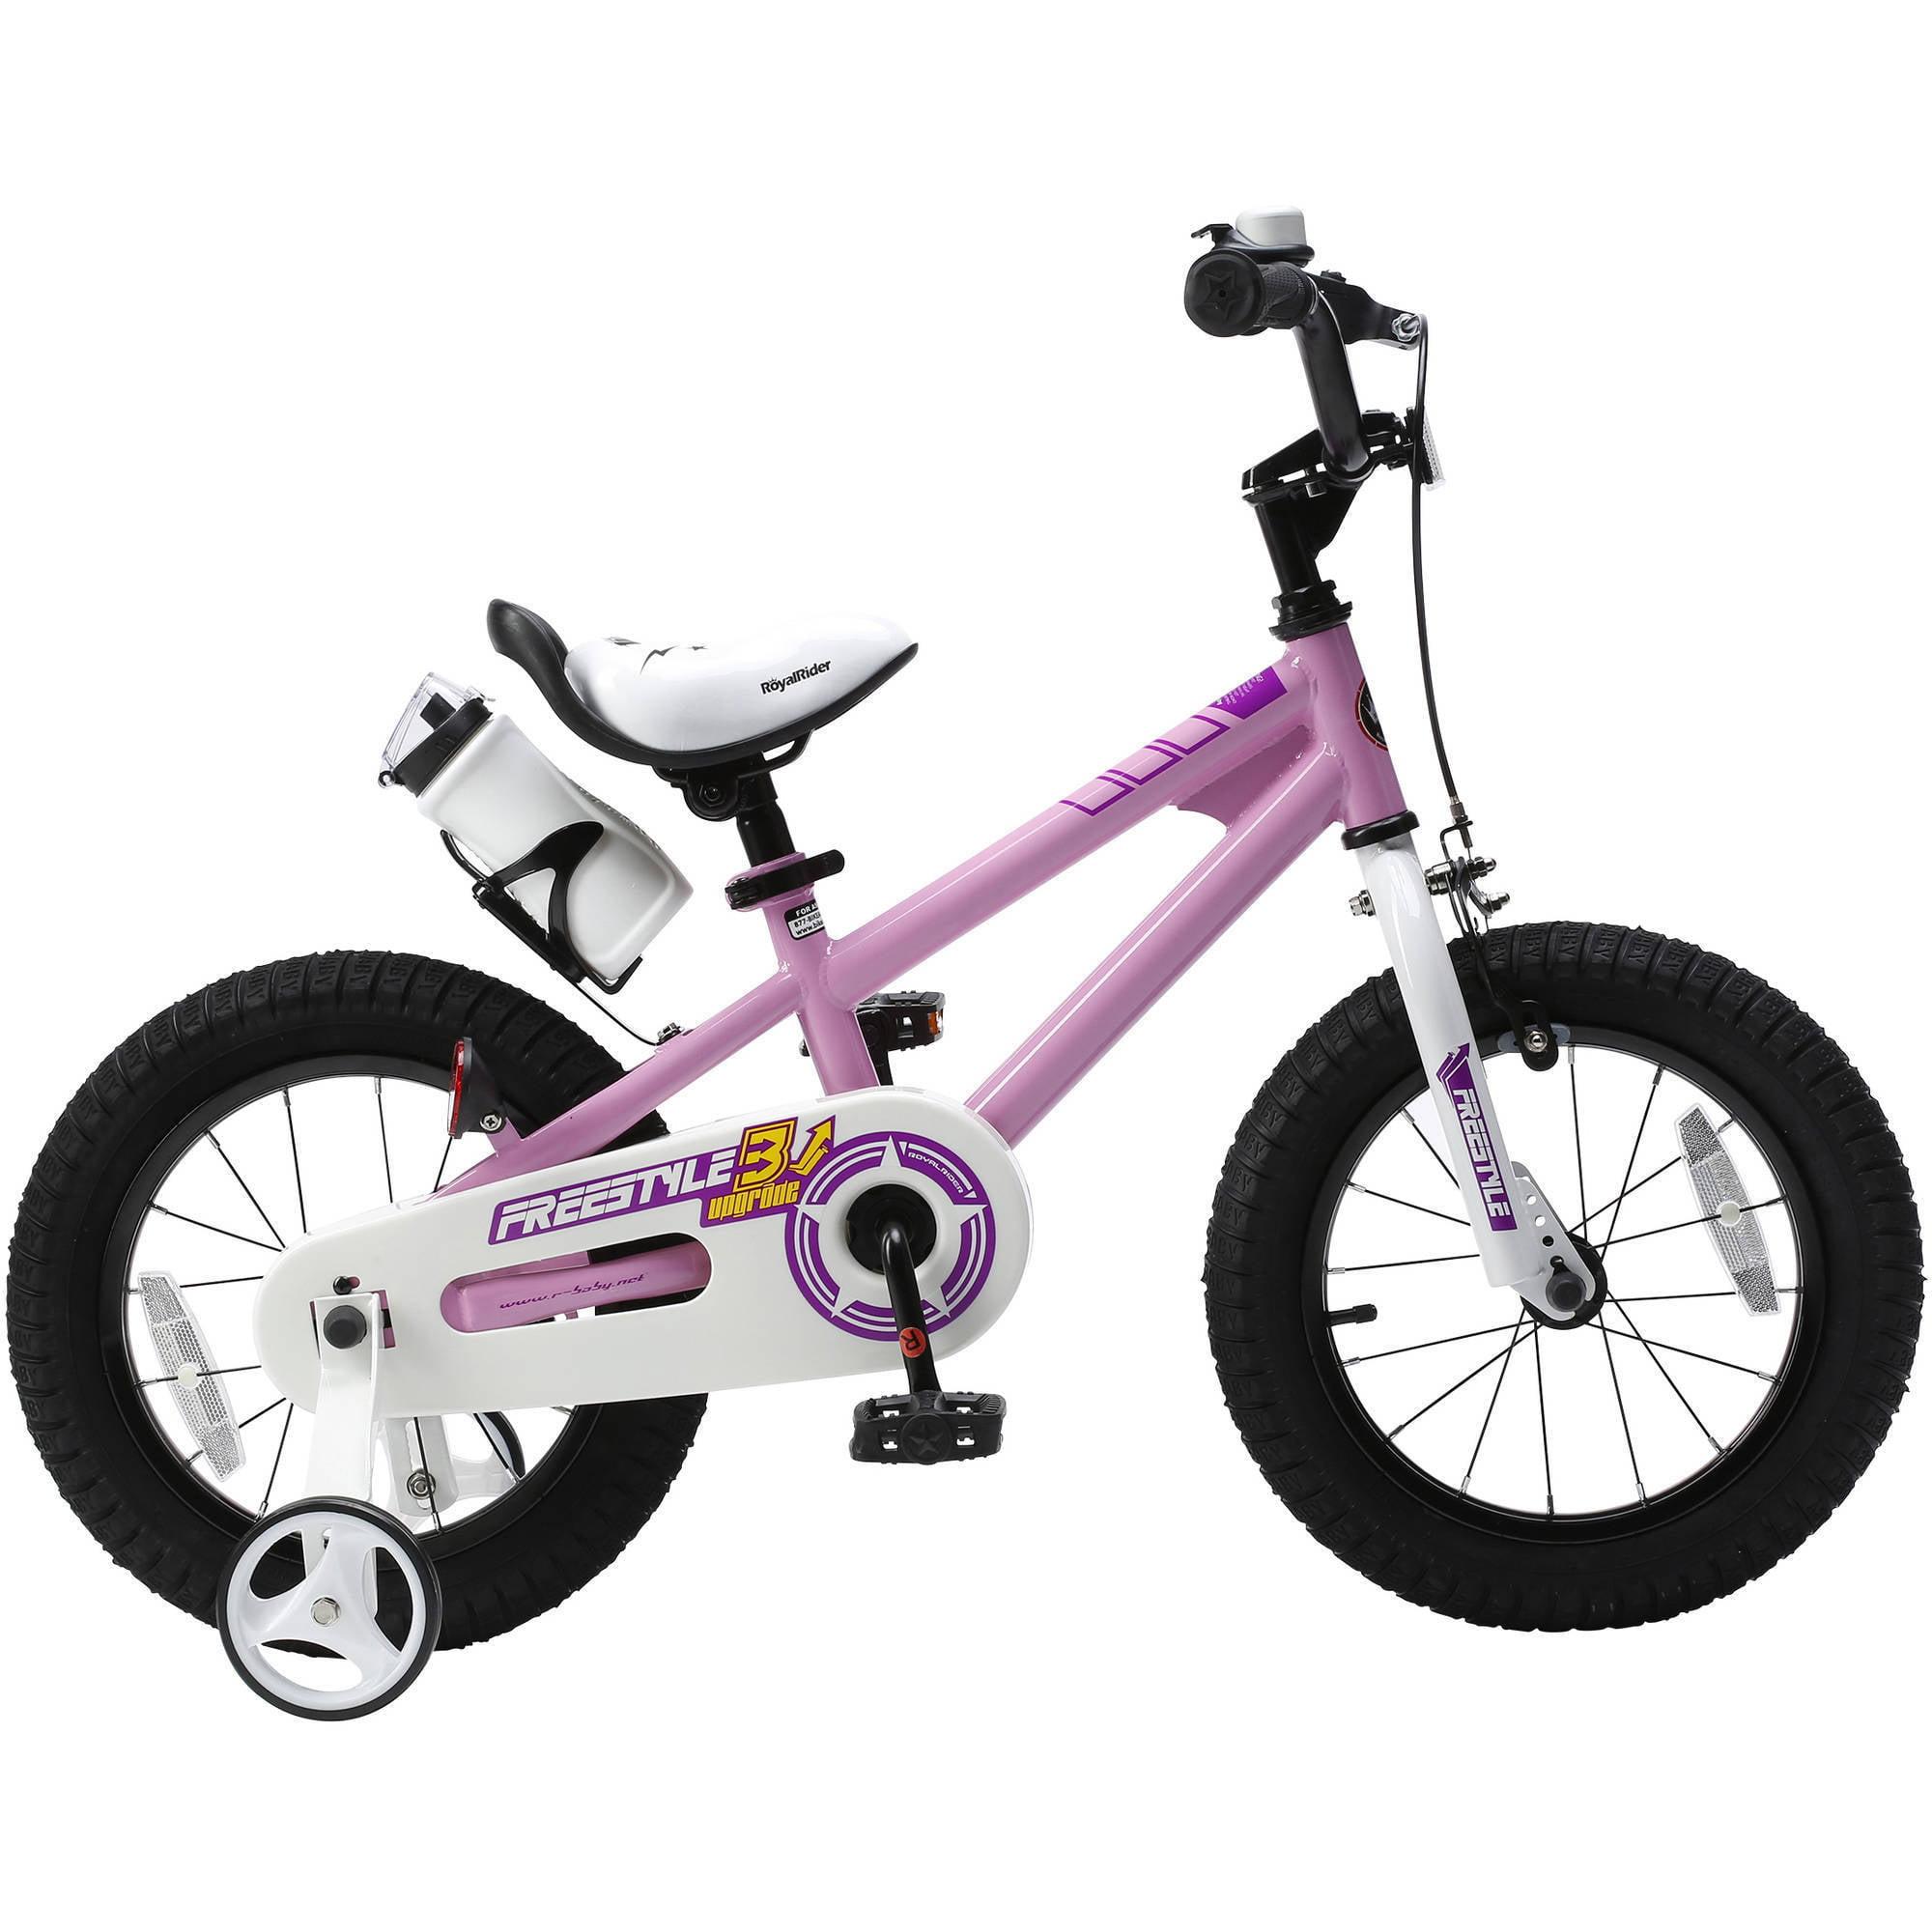 Royalbaby Freestyle Orange 12 Inch Kids Bicycle